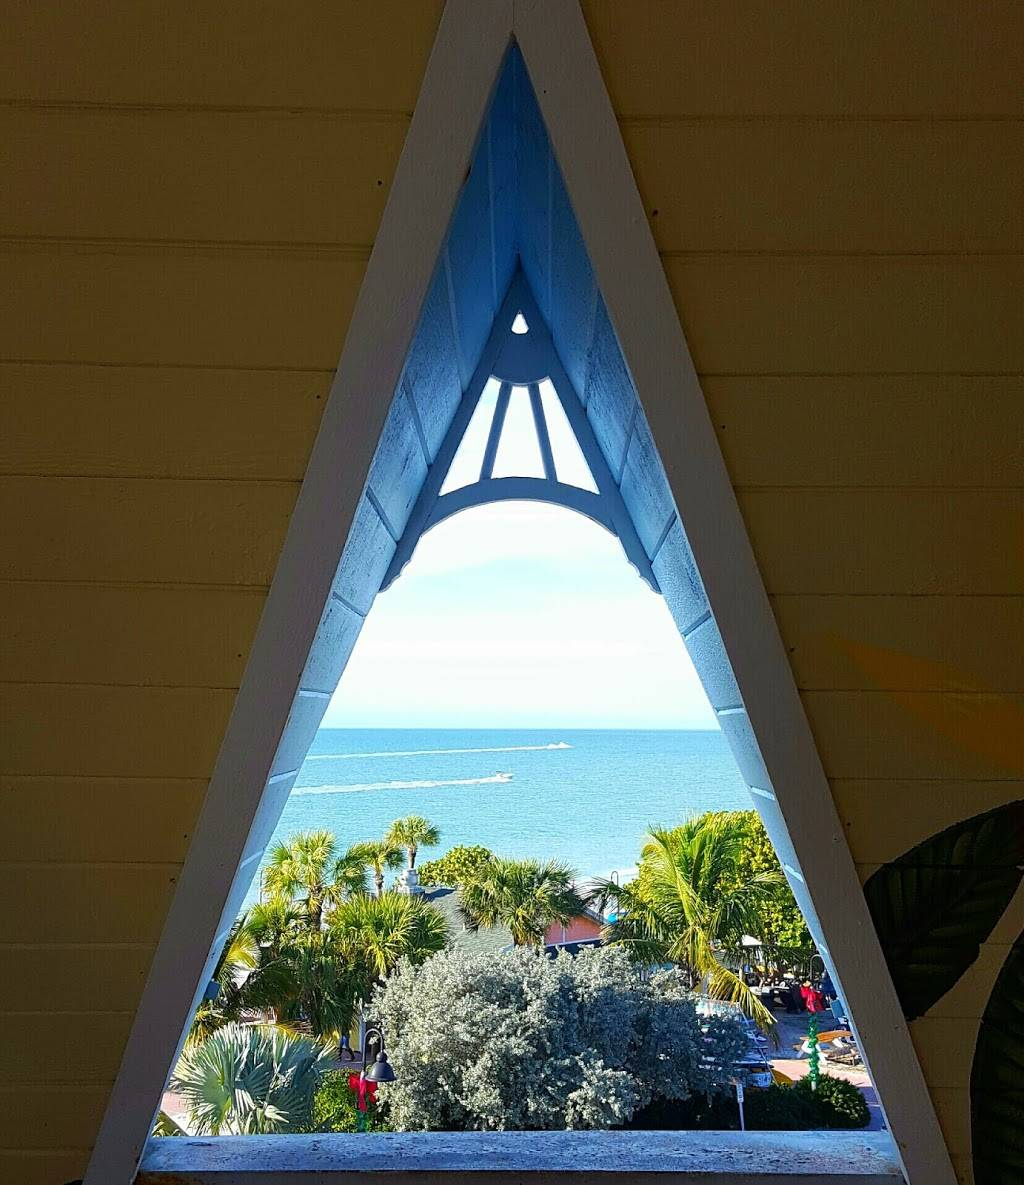 Hurricane Seafood Restaurant - restaurant  | Photo 8 of 9 | Address: 809 Gulf Way, St Pete Beach, FL 33706, USA | Phone: (727) 360-9558